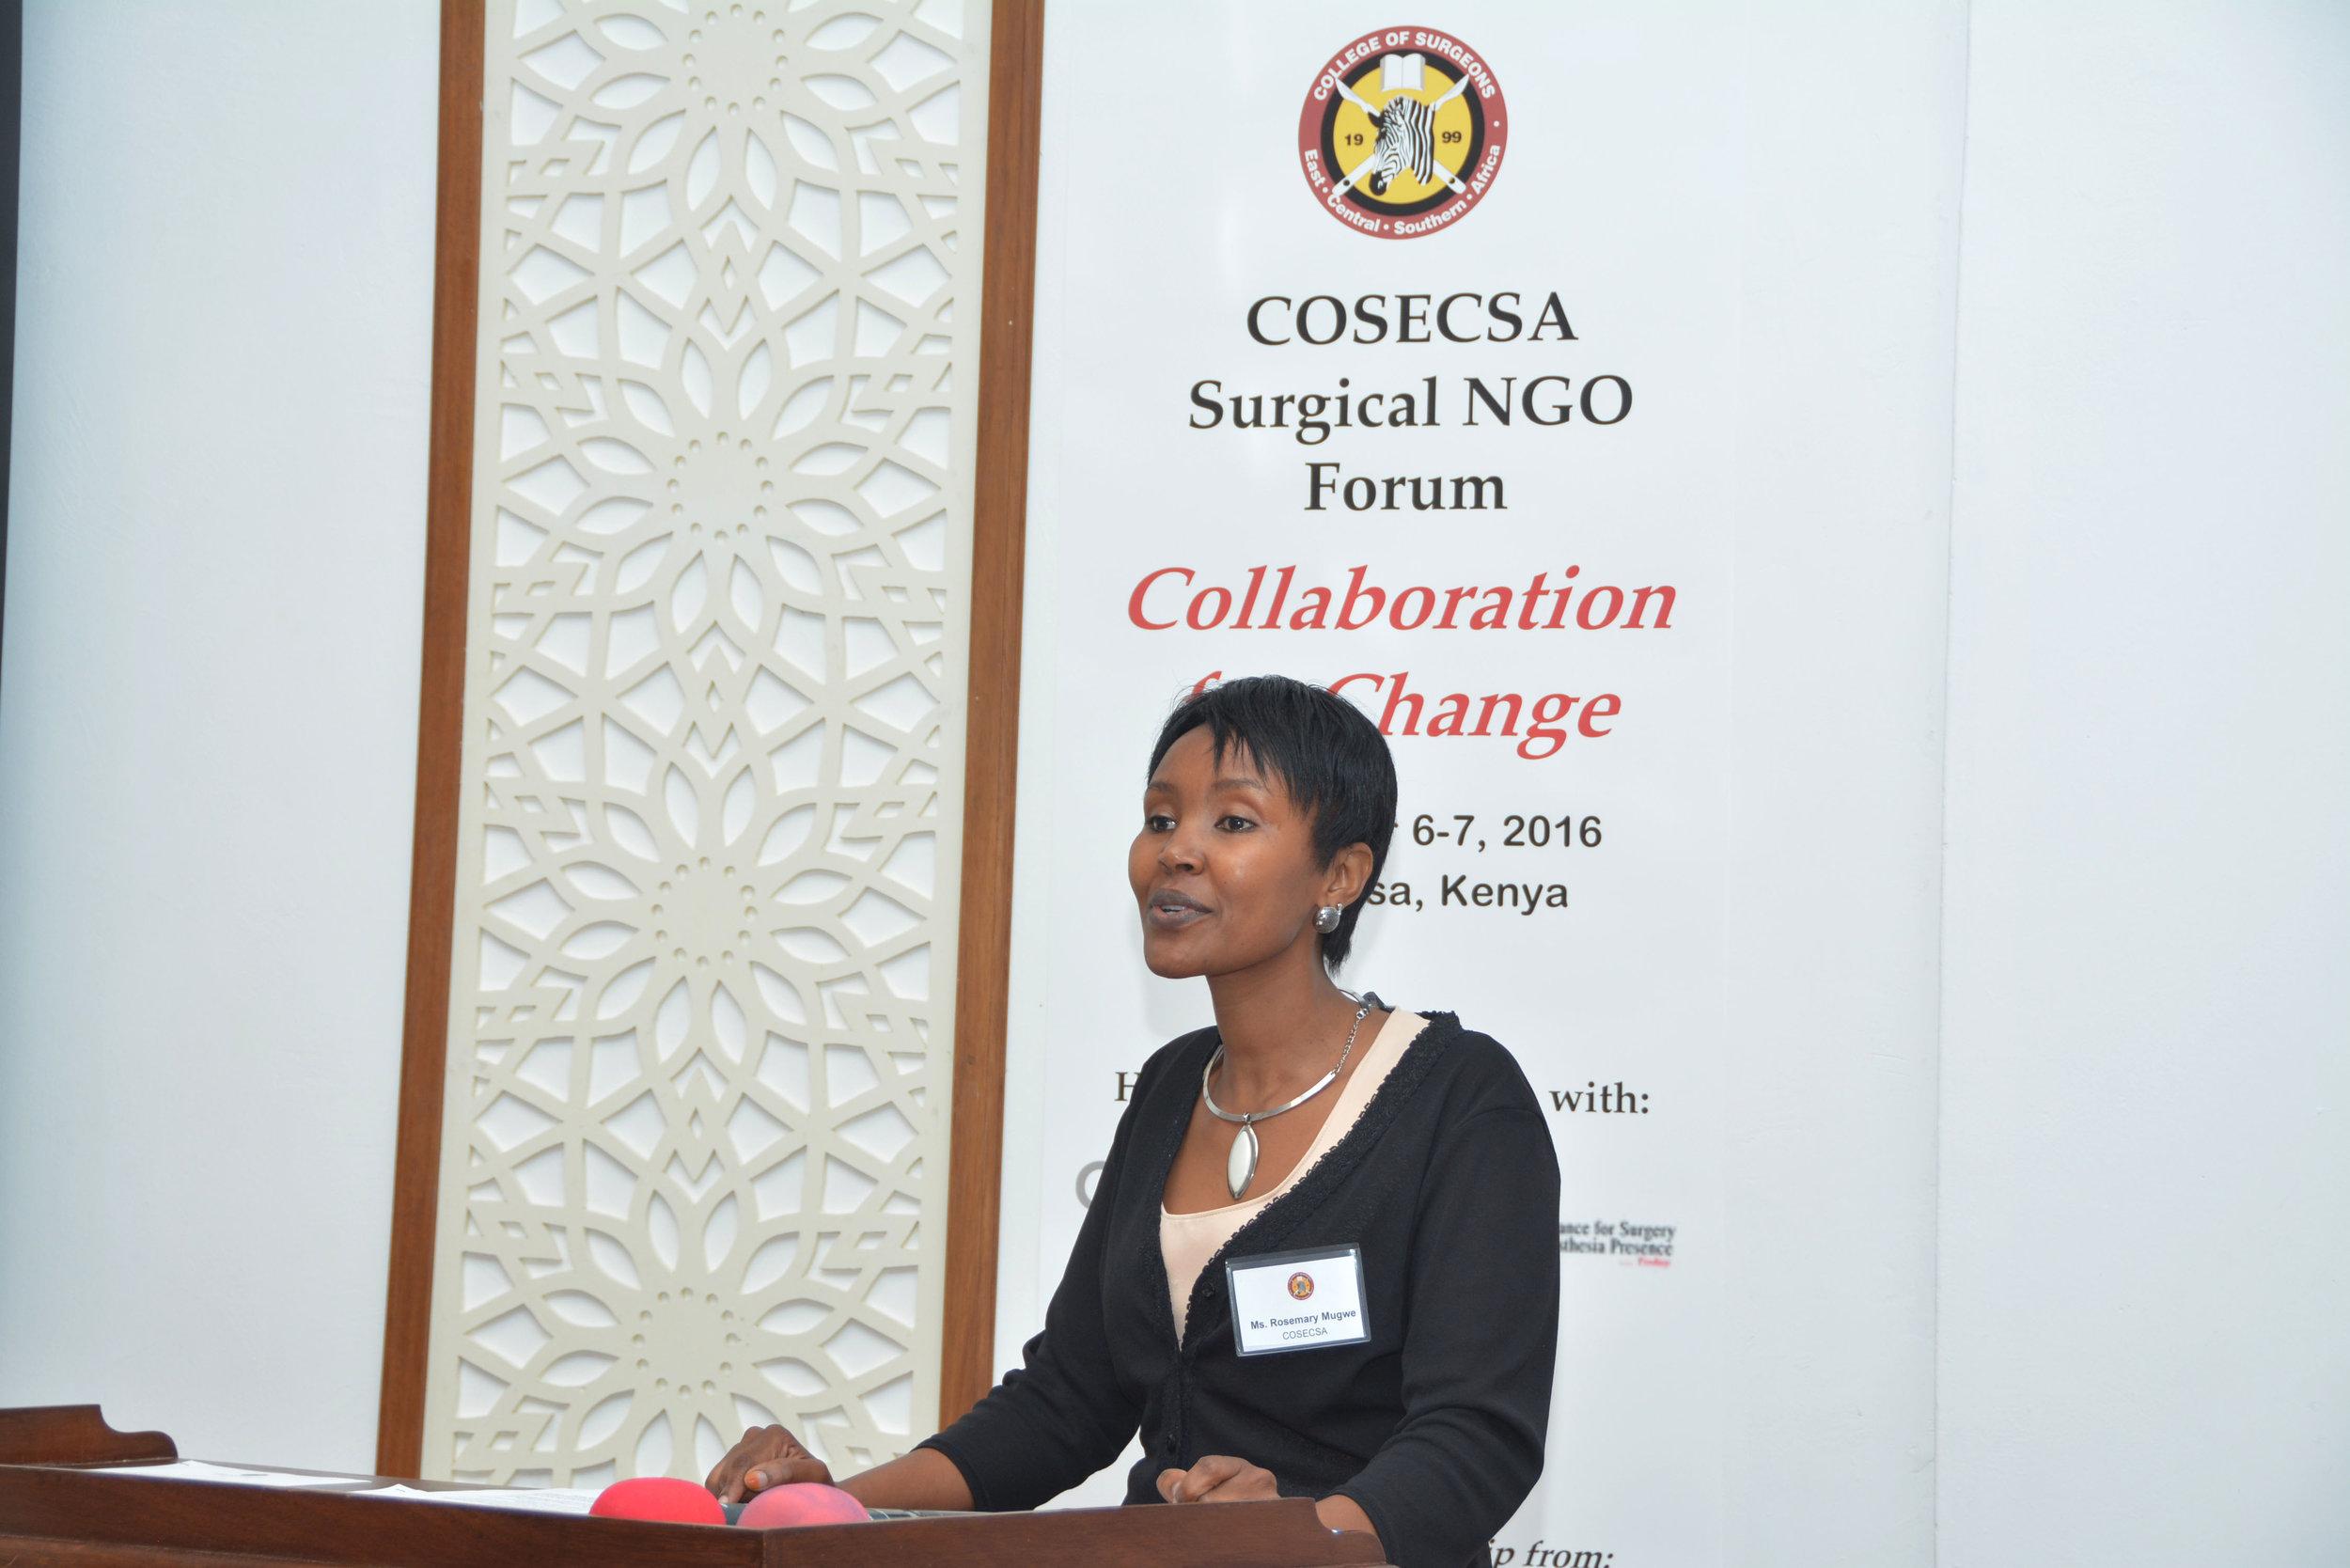 COSECSA Surgical NGO Forum - Ms. Rosemary Mugwe - CEO, COSECSA.JPG